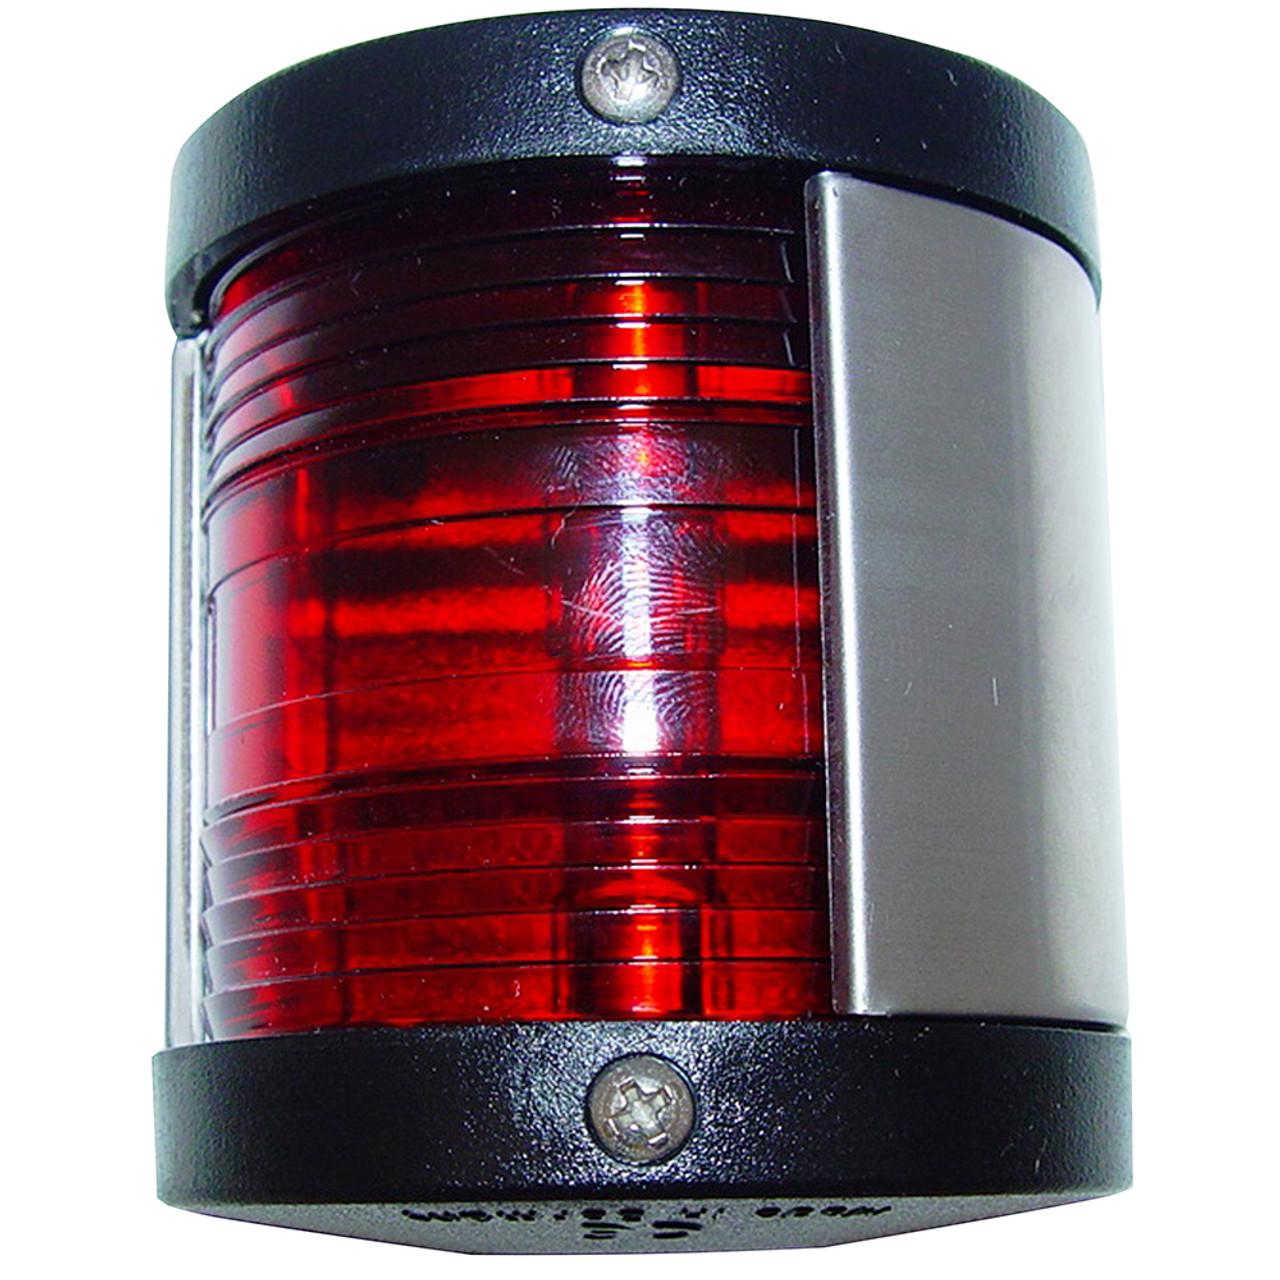 New Series 25 Classic Side Light aqua Signal 25200-7 Starboard Green Lens